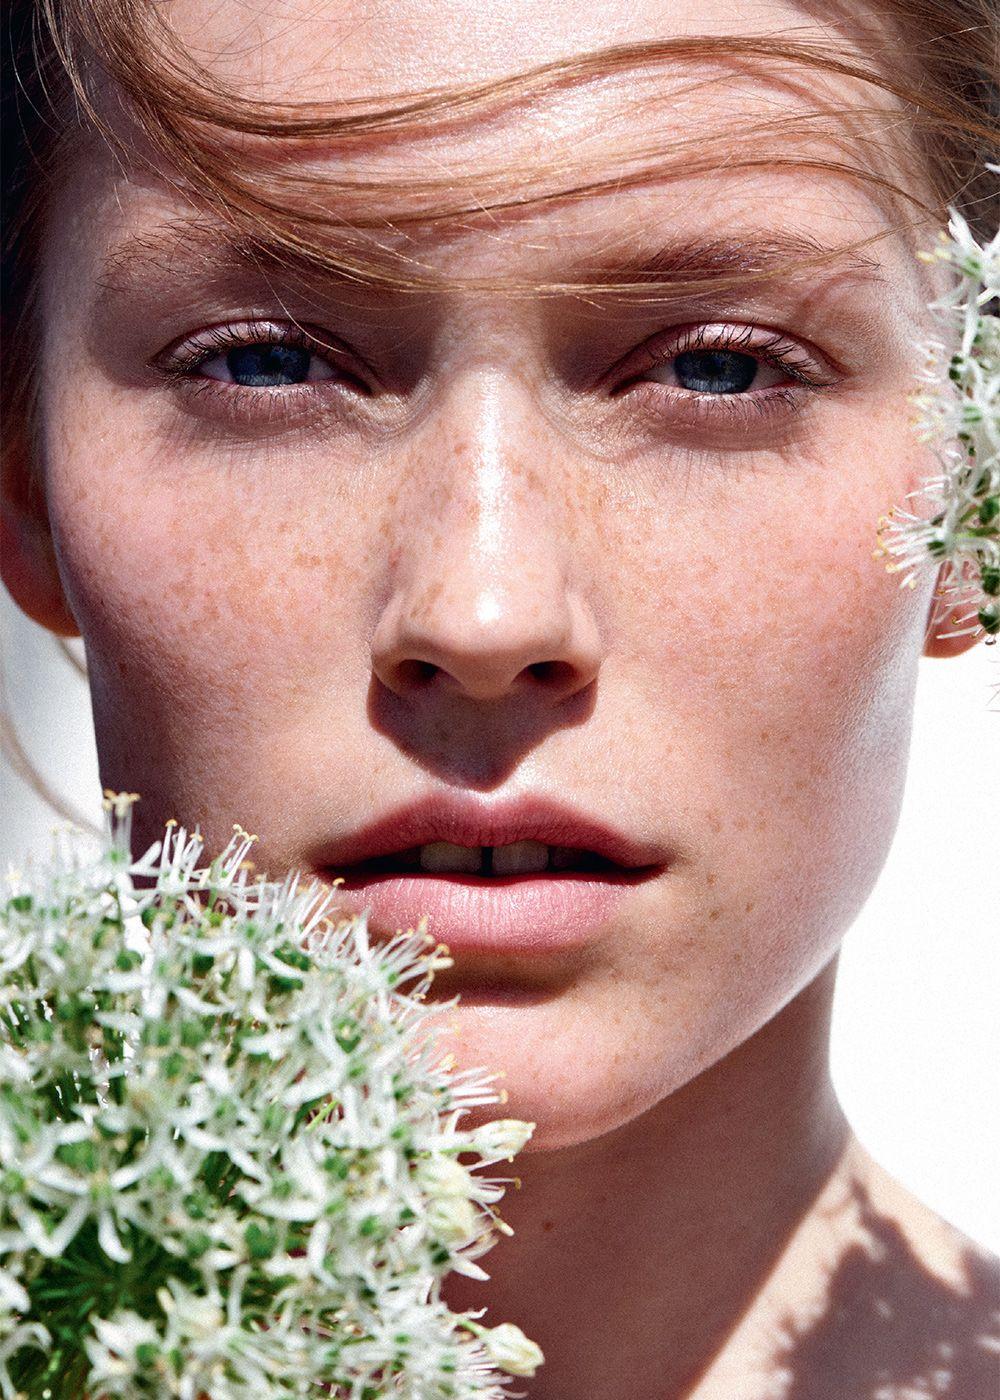 SkinSchool: Is your acid habit ageing you?